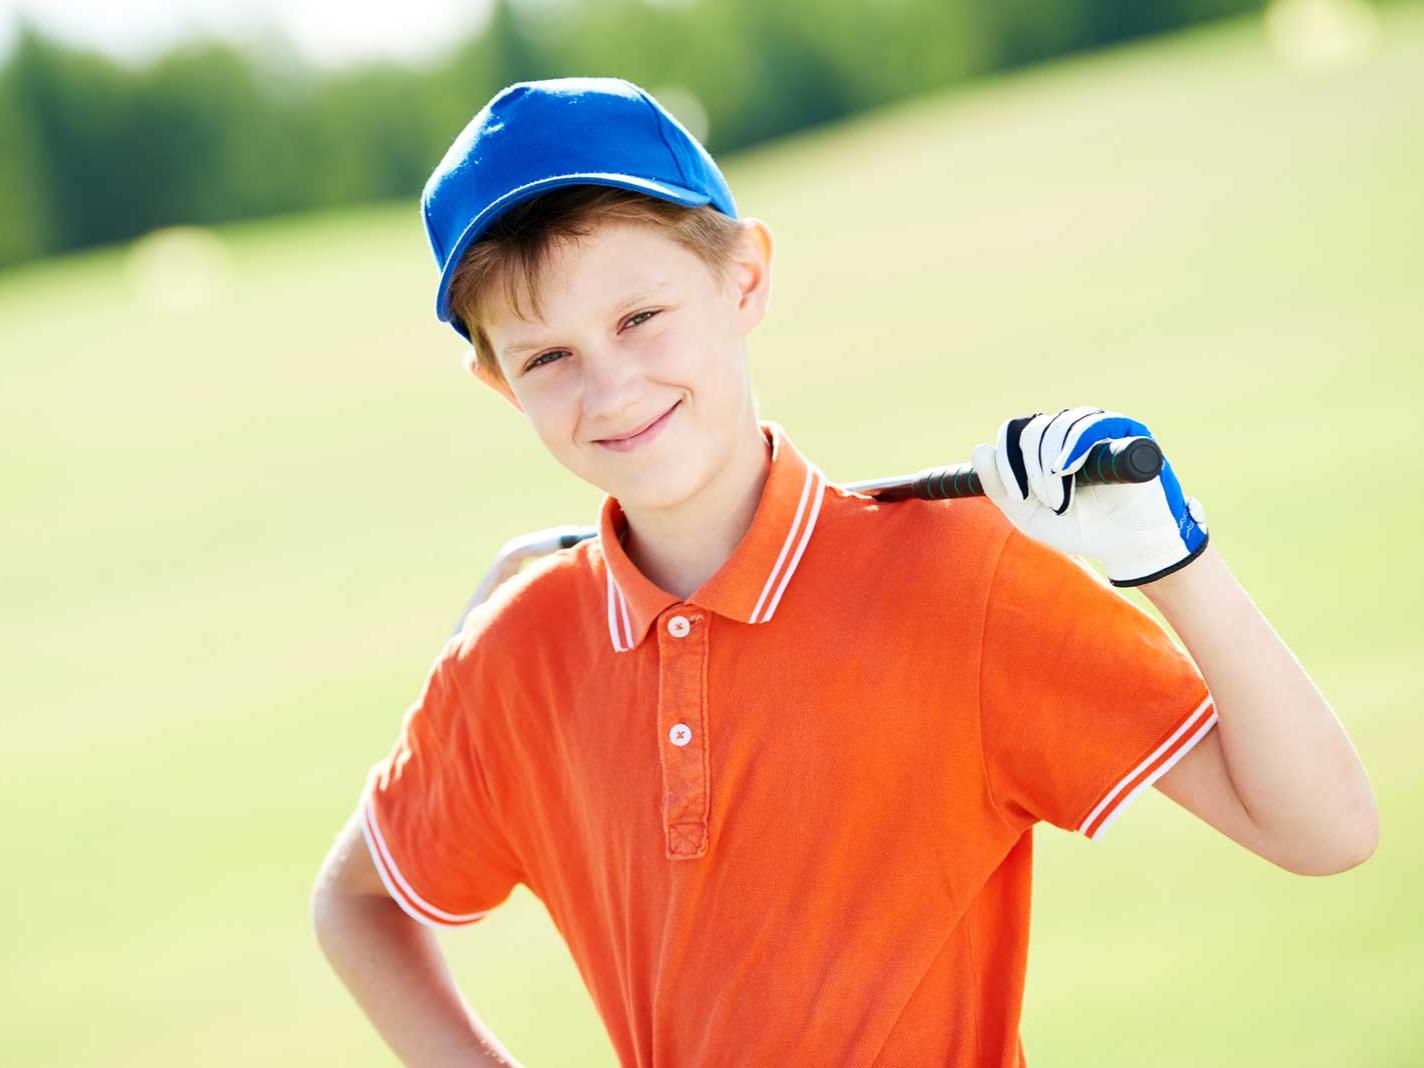 web-Boy-golf-player-portrait-with--200151028.jpg